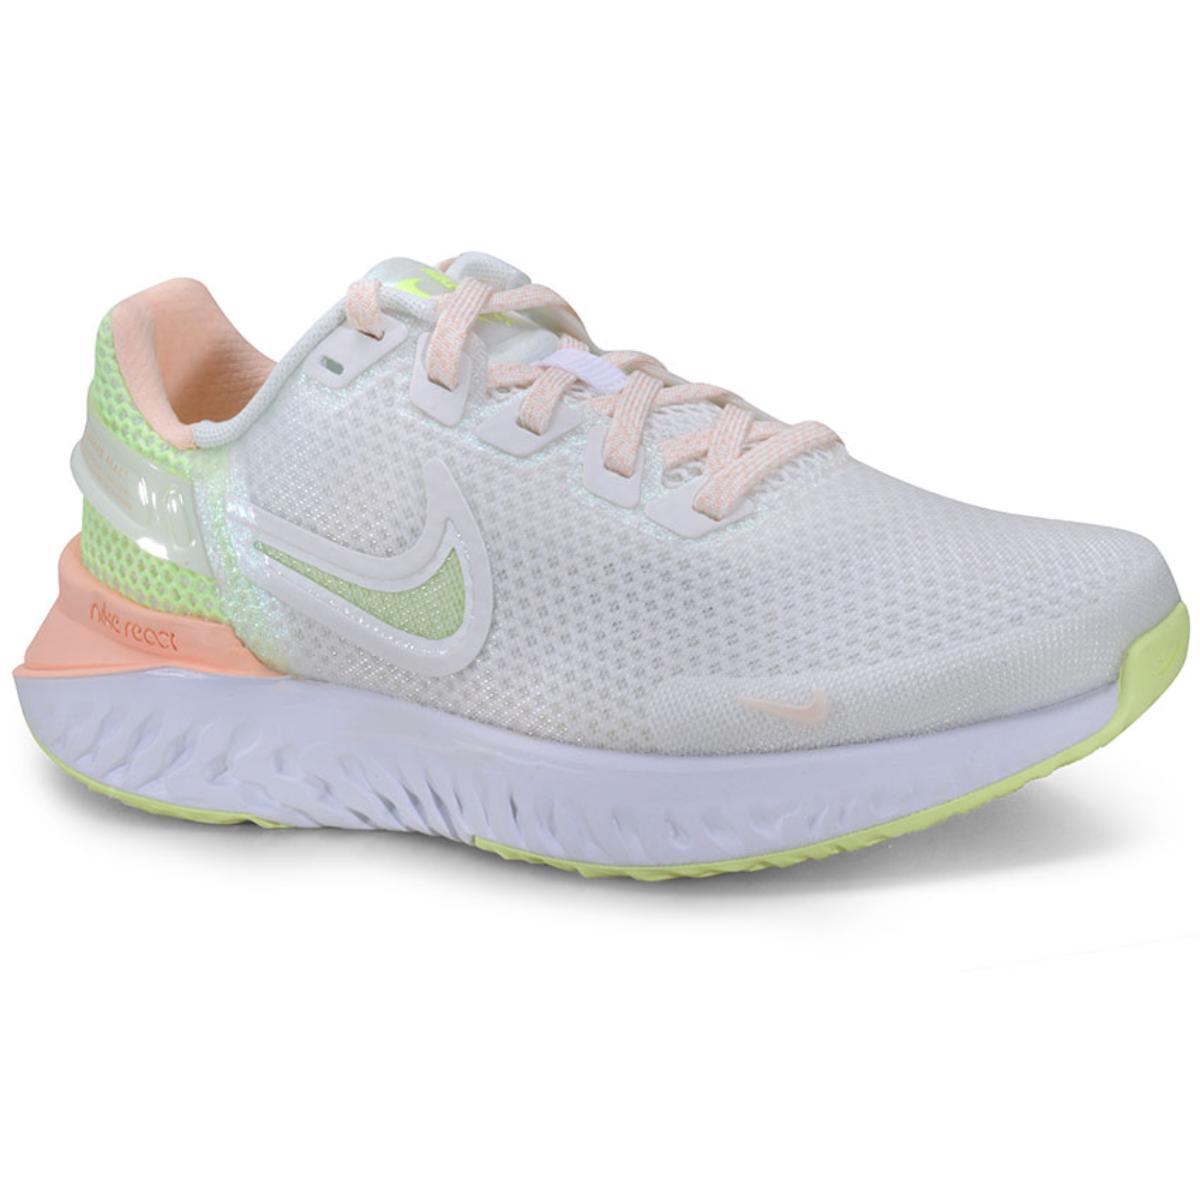 Tênis Feminino Nike Ck2562-100 Legend React 3 Branco/pêssego